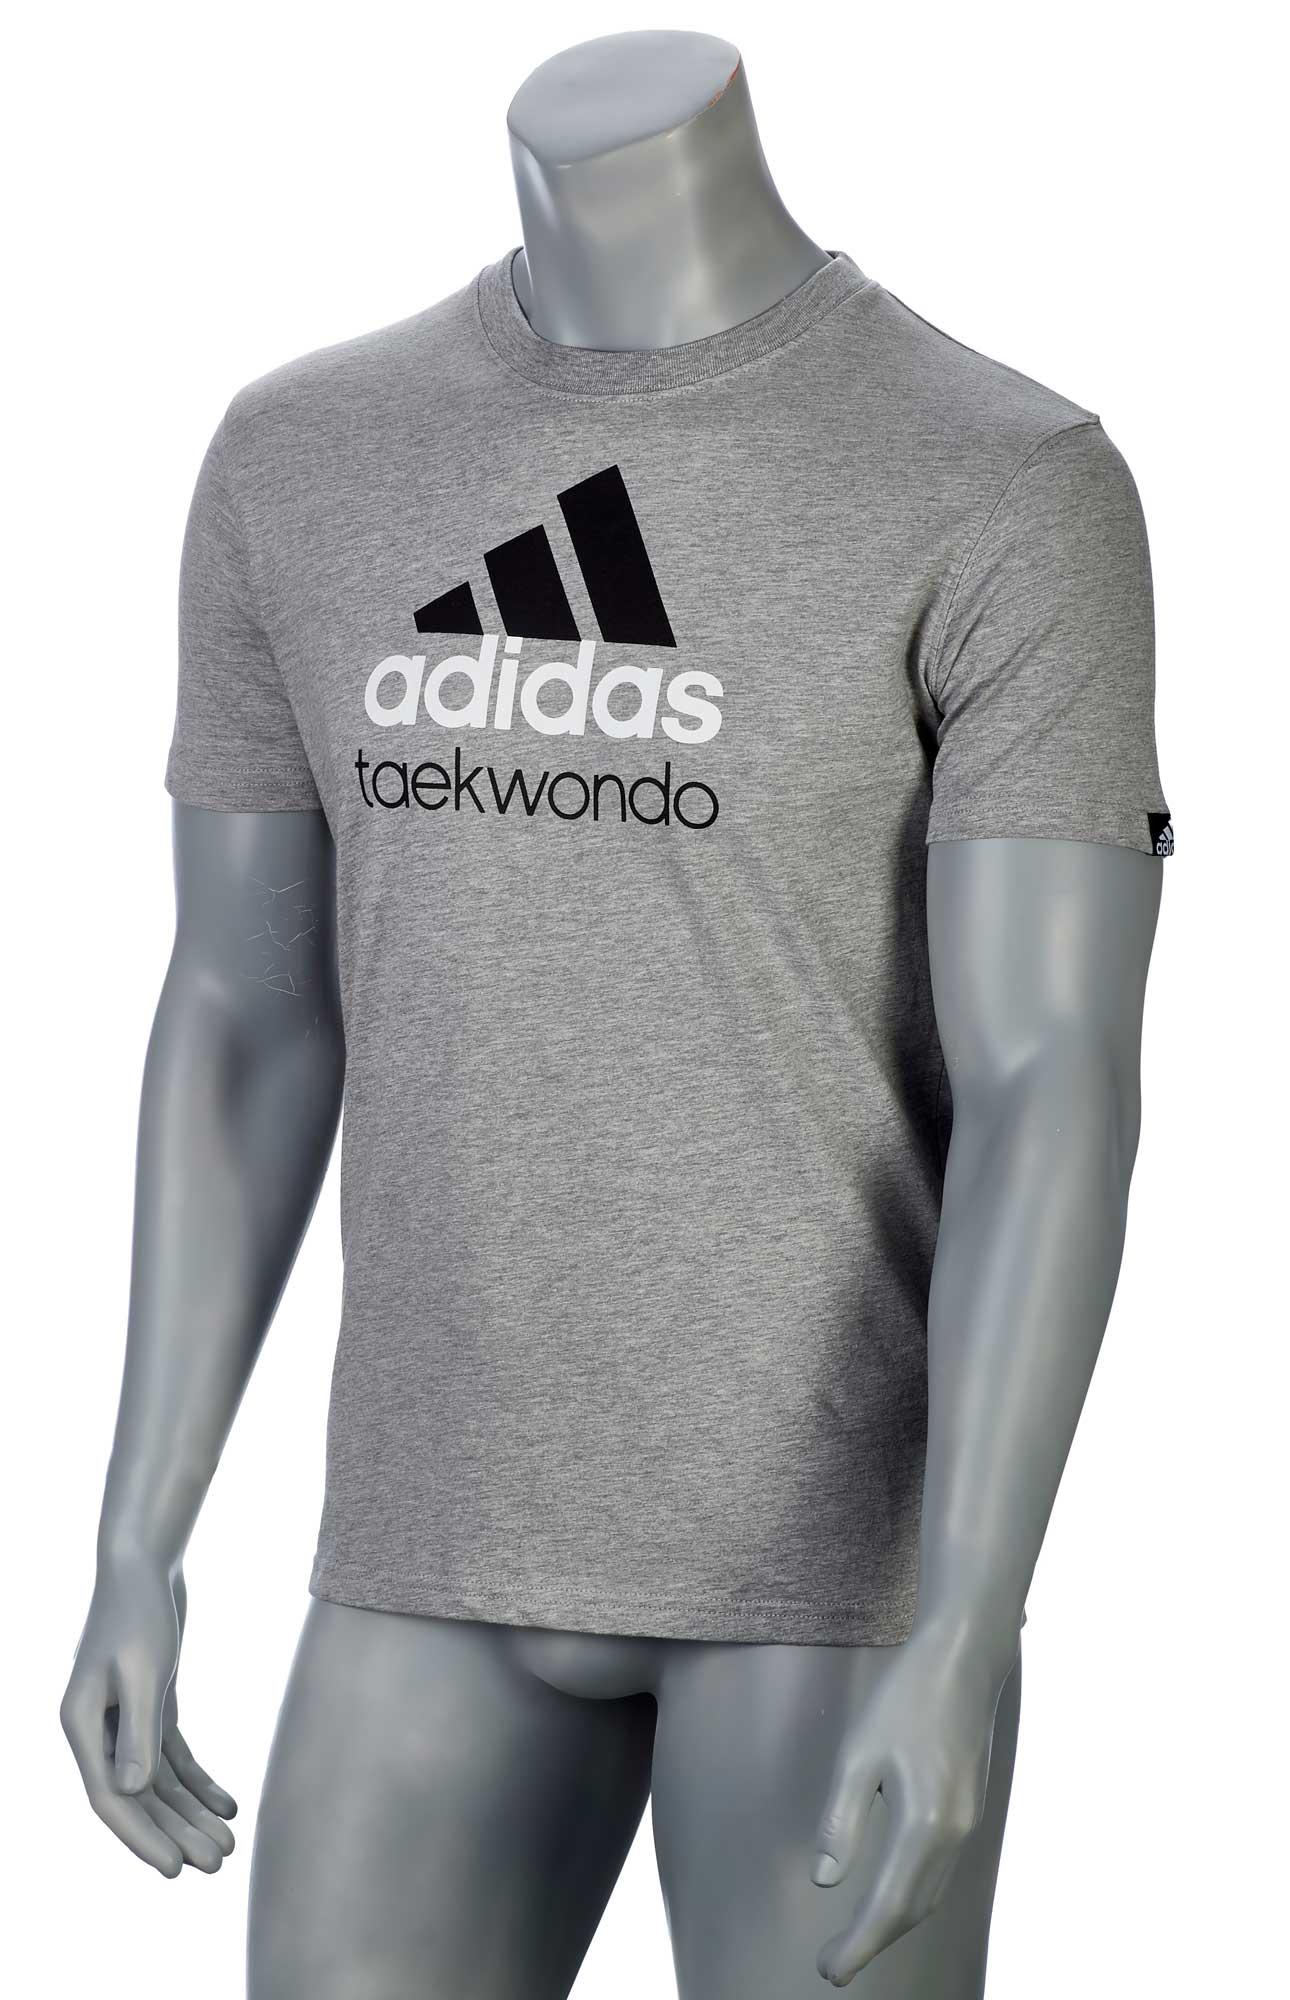 adidas Community line T Shirt Taekwondo grauschwarz